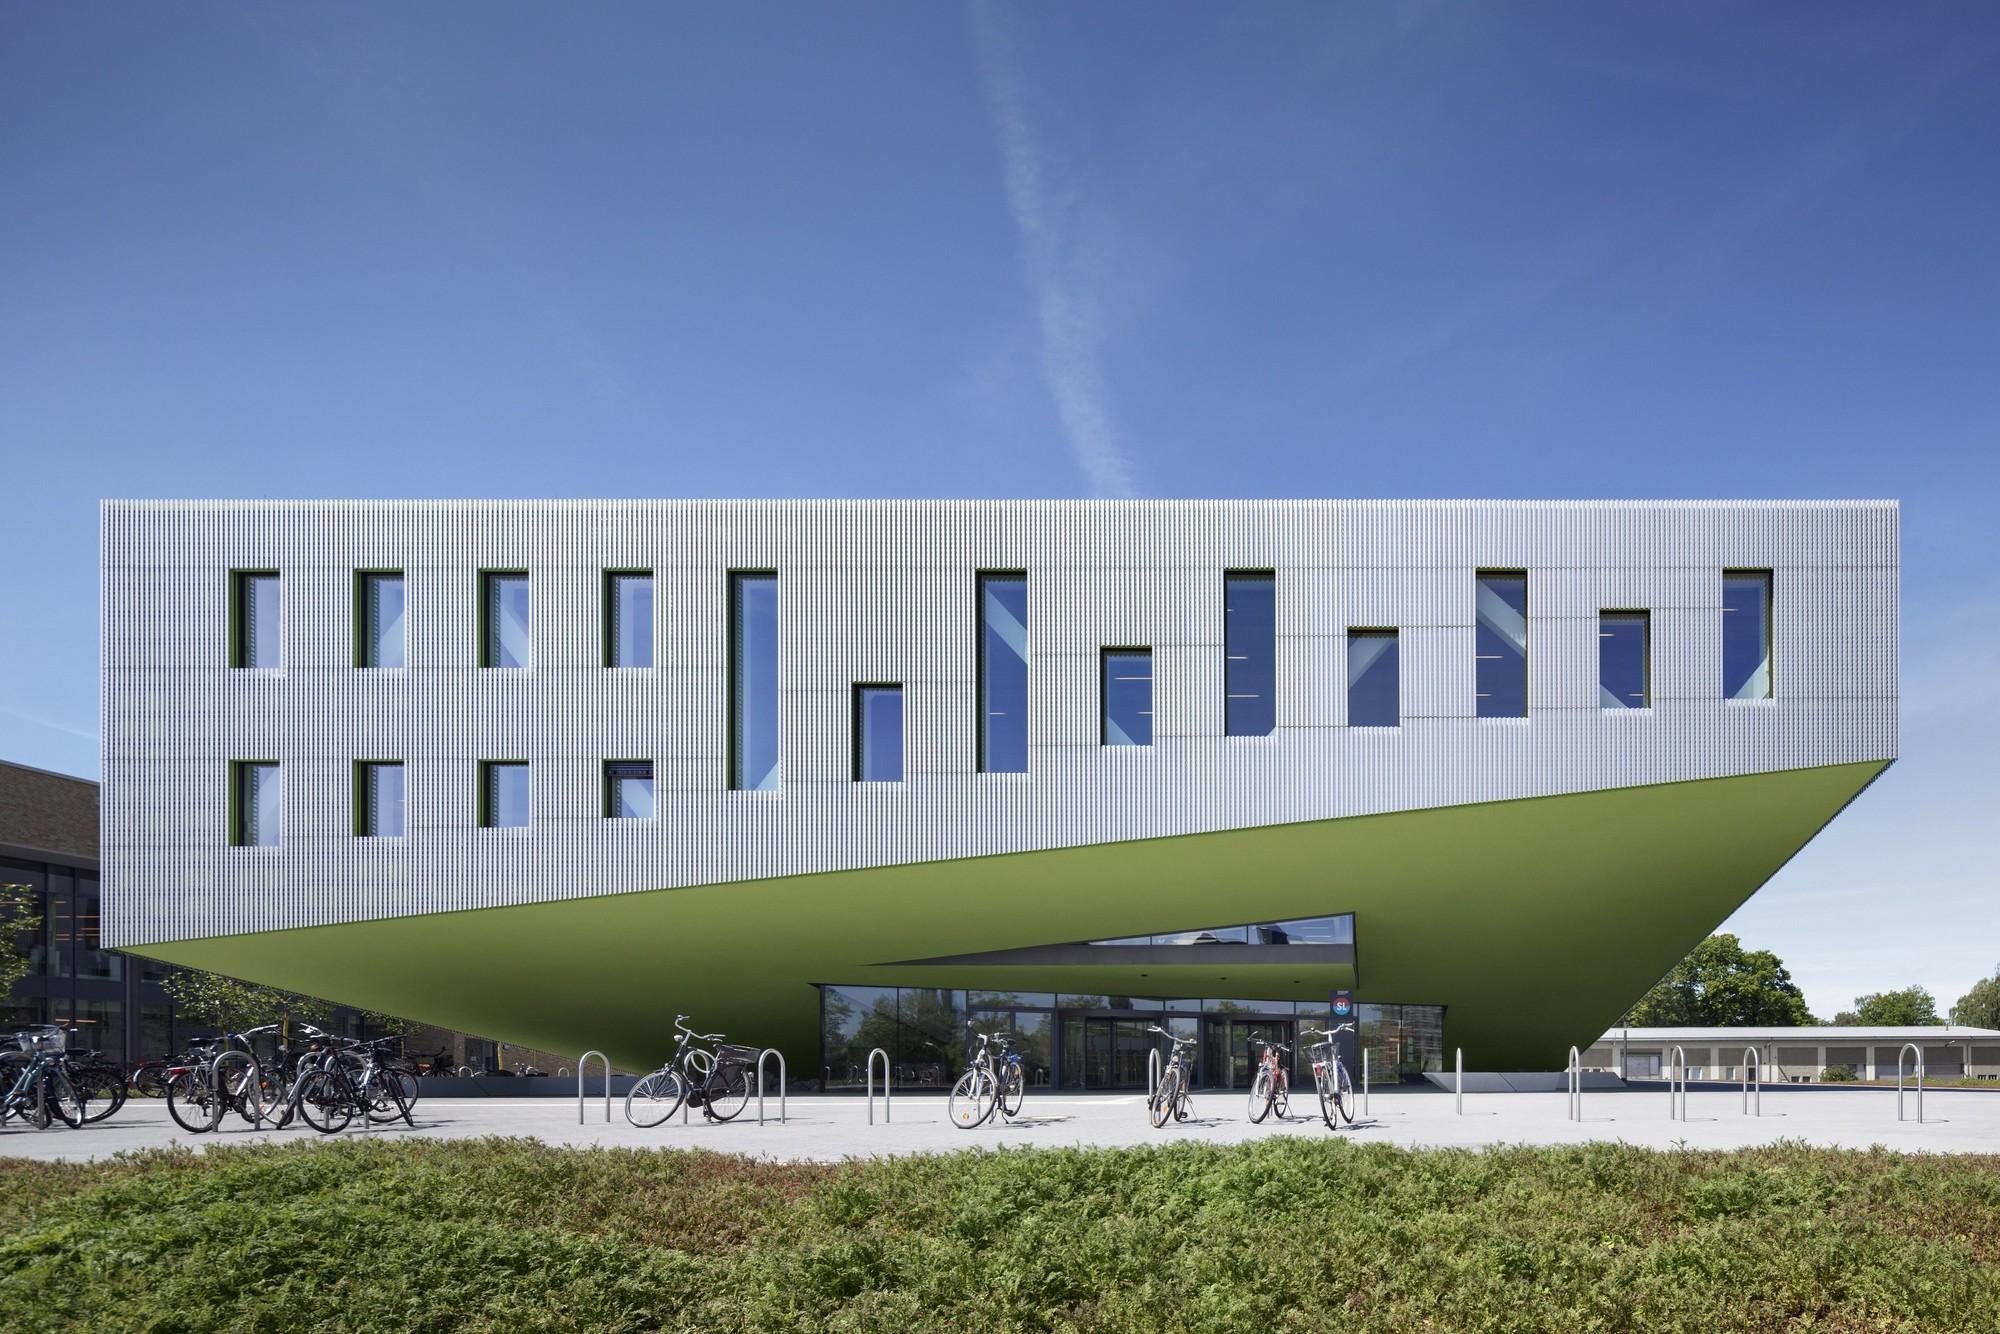 Campus Universitário de Osnabrück / Benthem Crouwel Architects, © Jens Kirchner